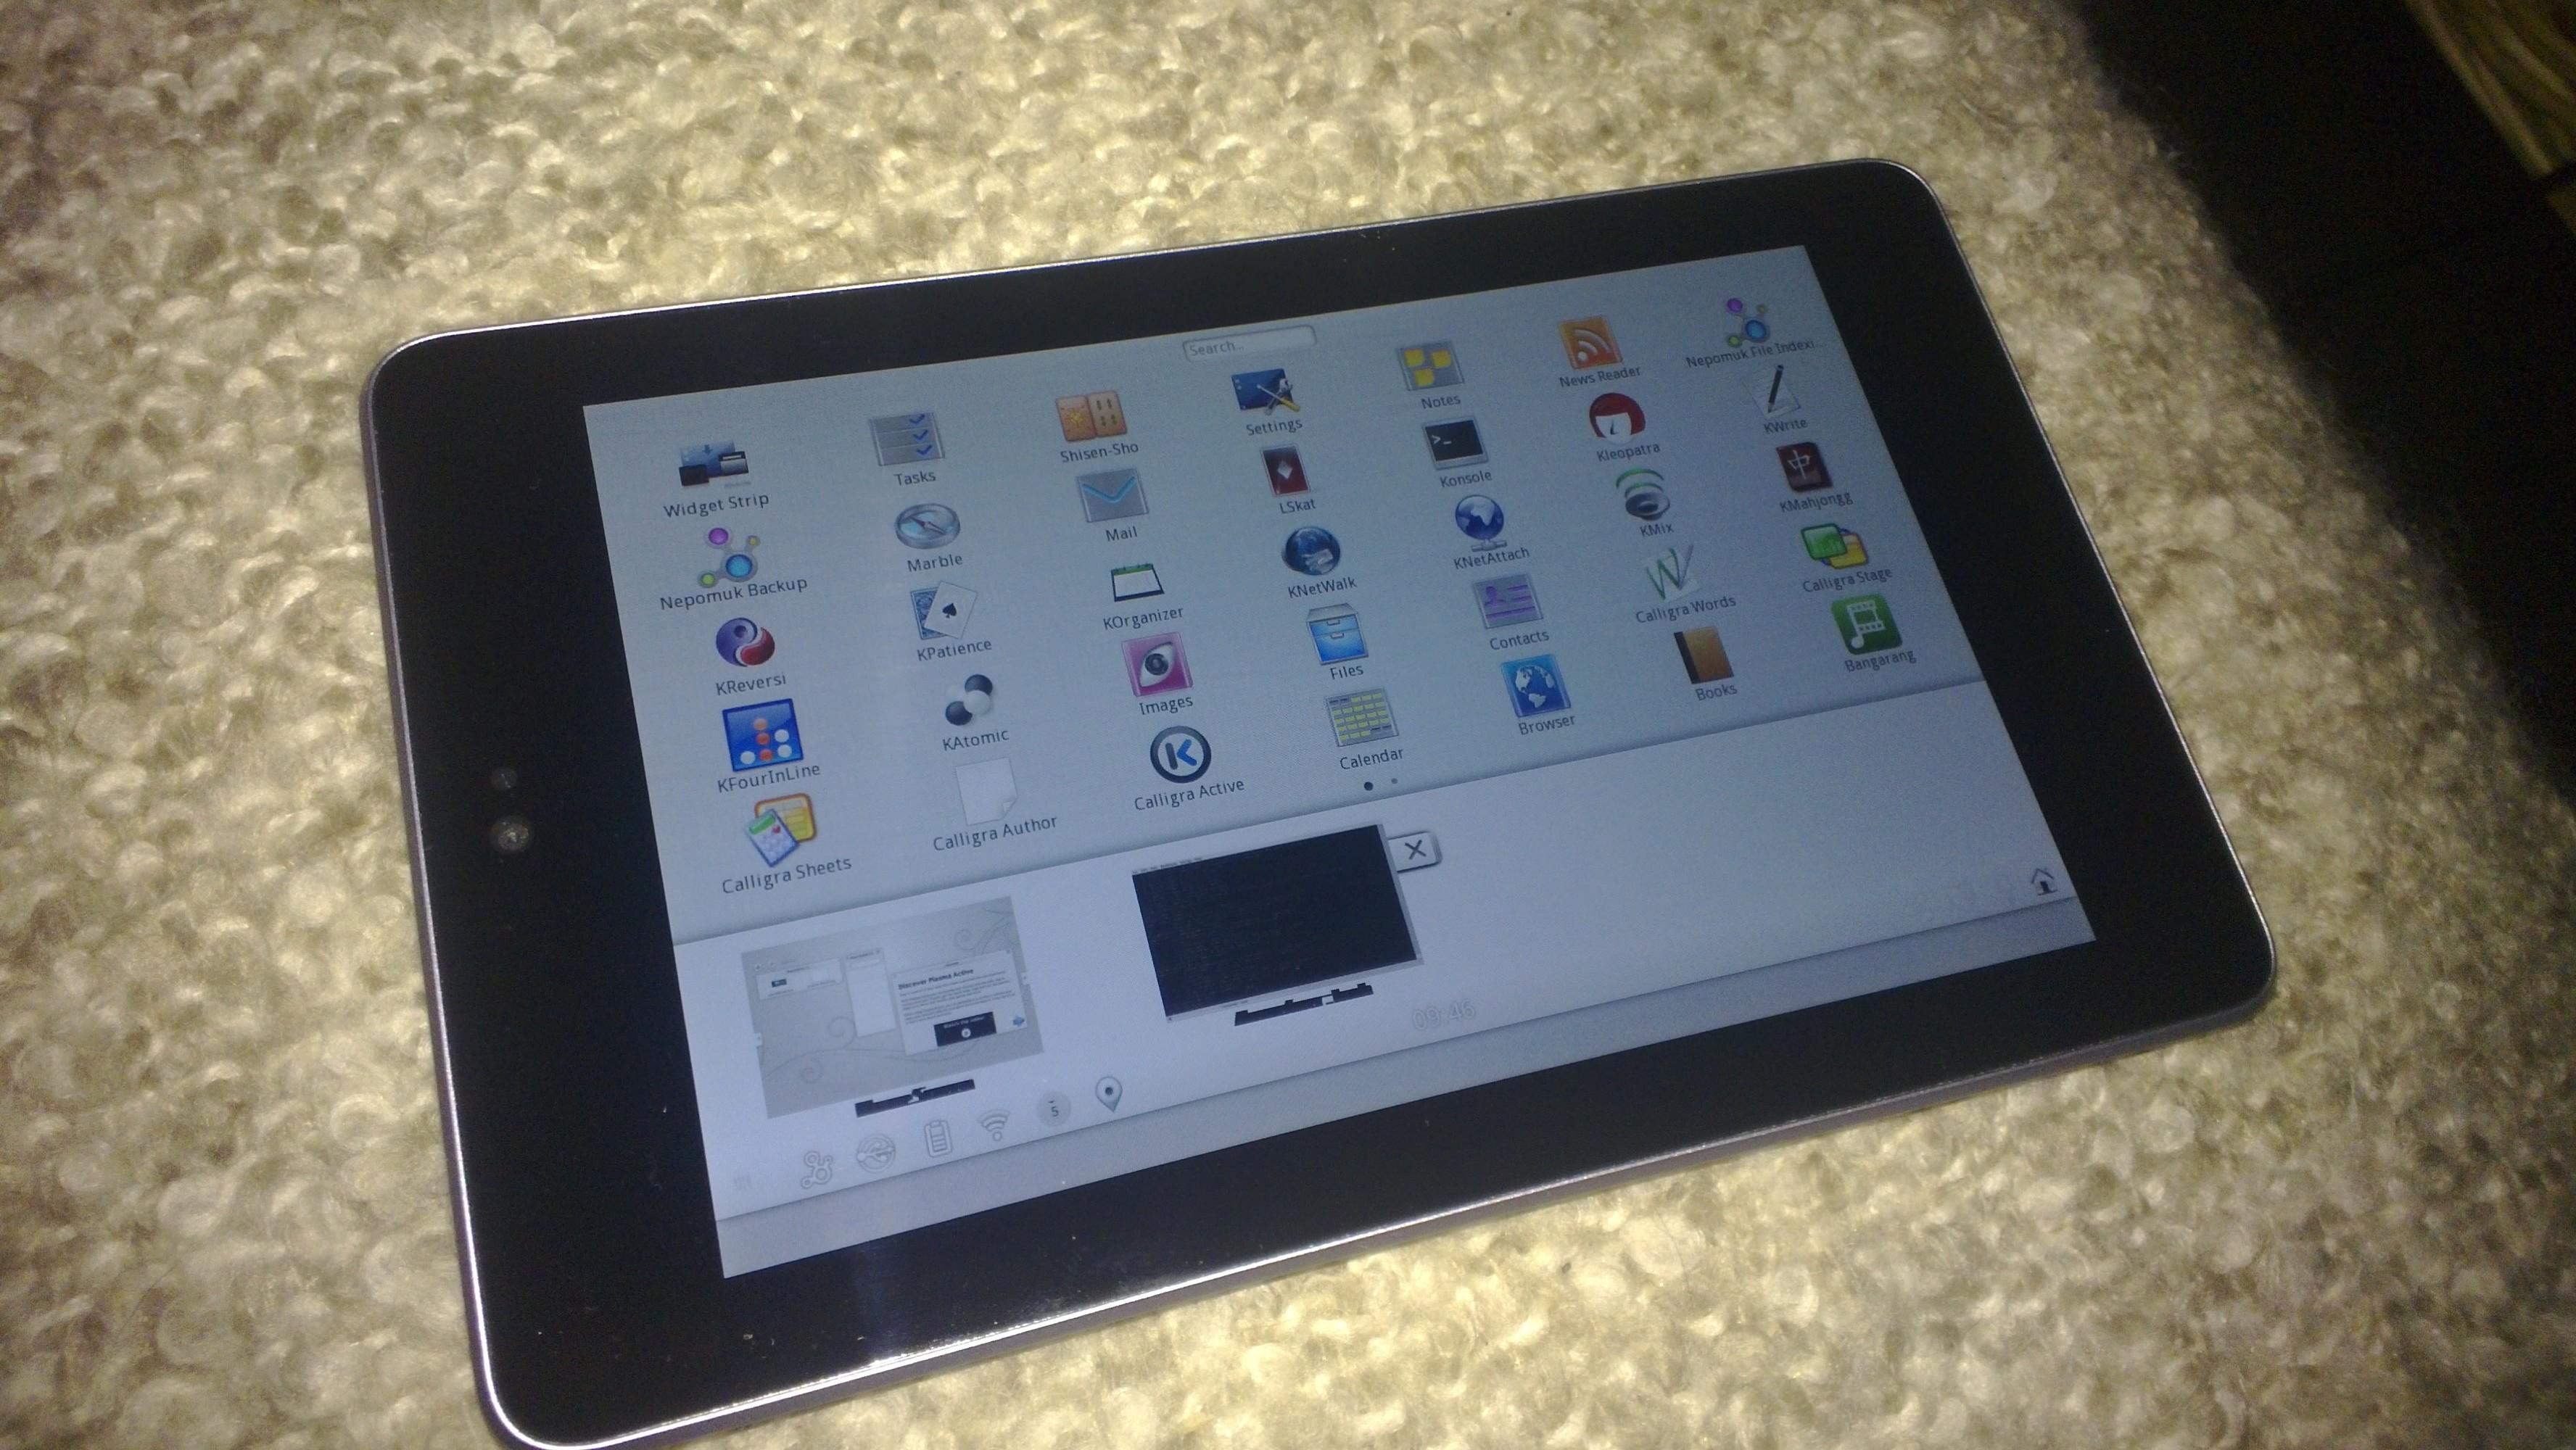 Plasma Active For Nexus 7 Running The Touch Optimized Plasma Active Linux Distribution On Nexus 7 Ruedigergad